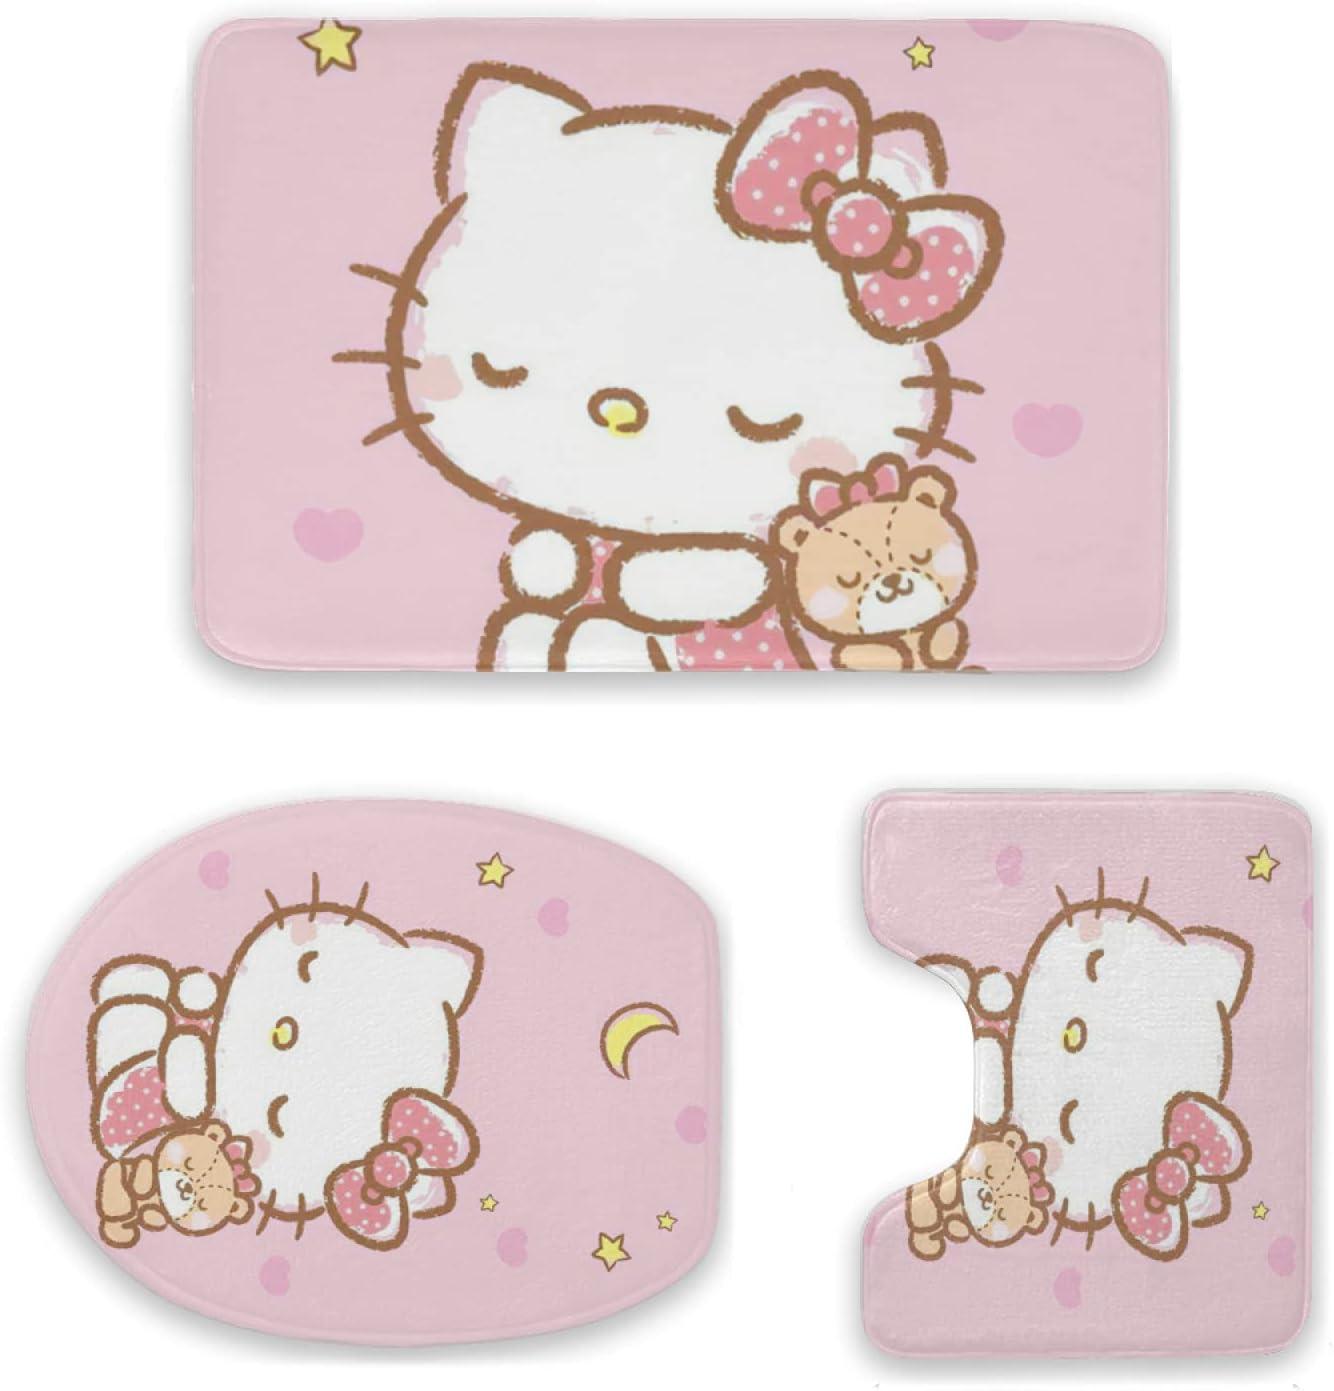 Sanrio Sale Special Price Hello Kitty Max 46% OFF Bath Mat 3 Set Bathroom Piece Rugs Carpet